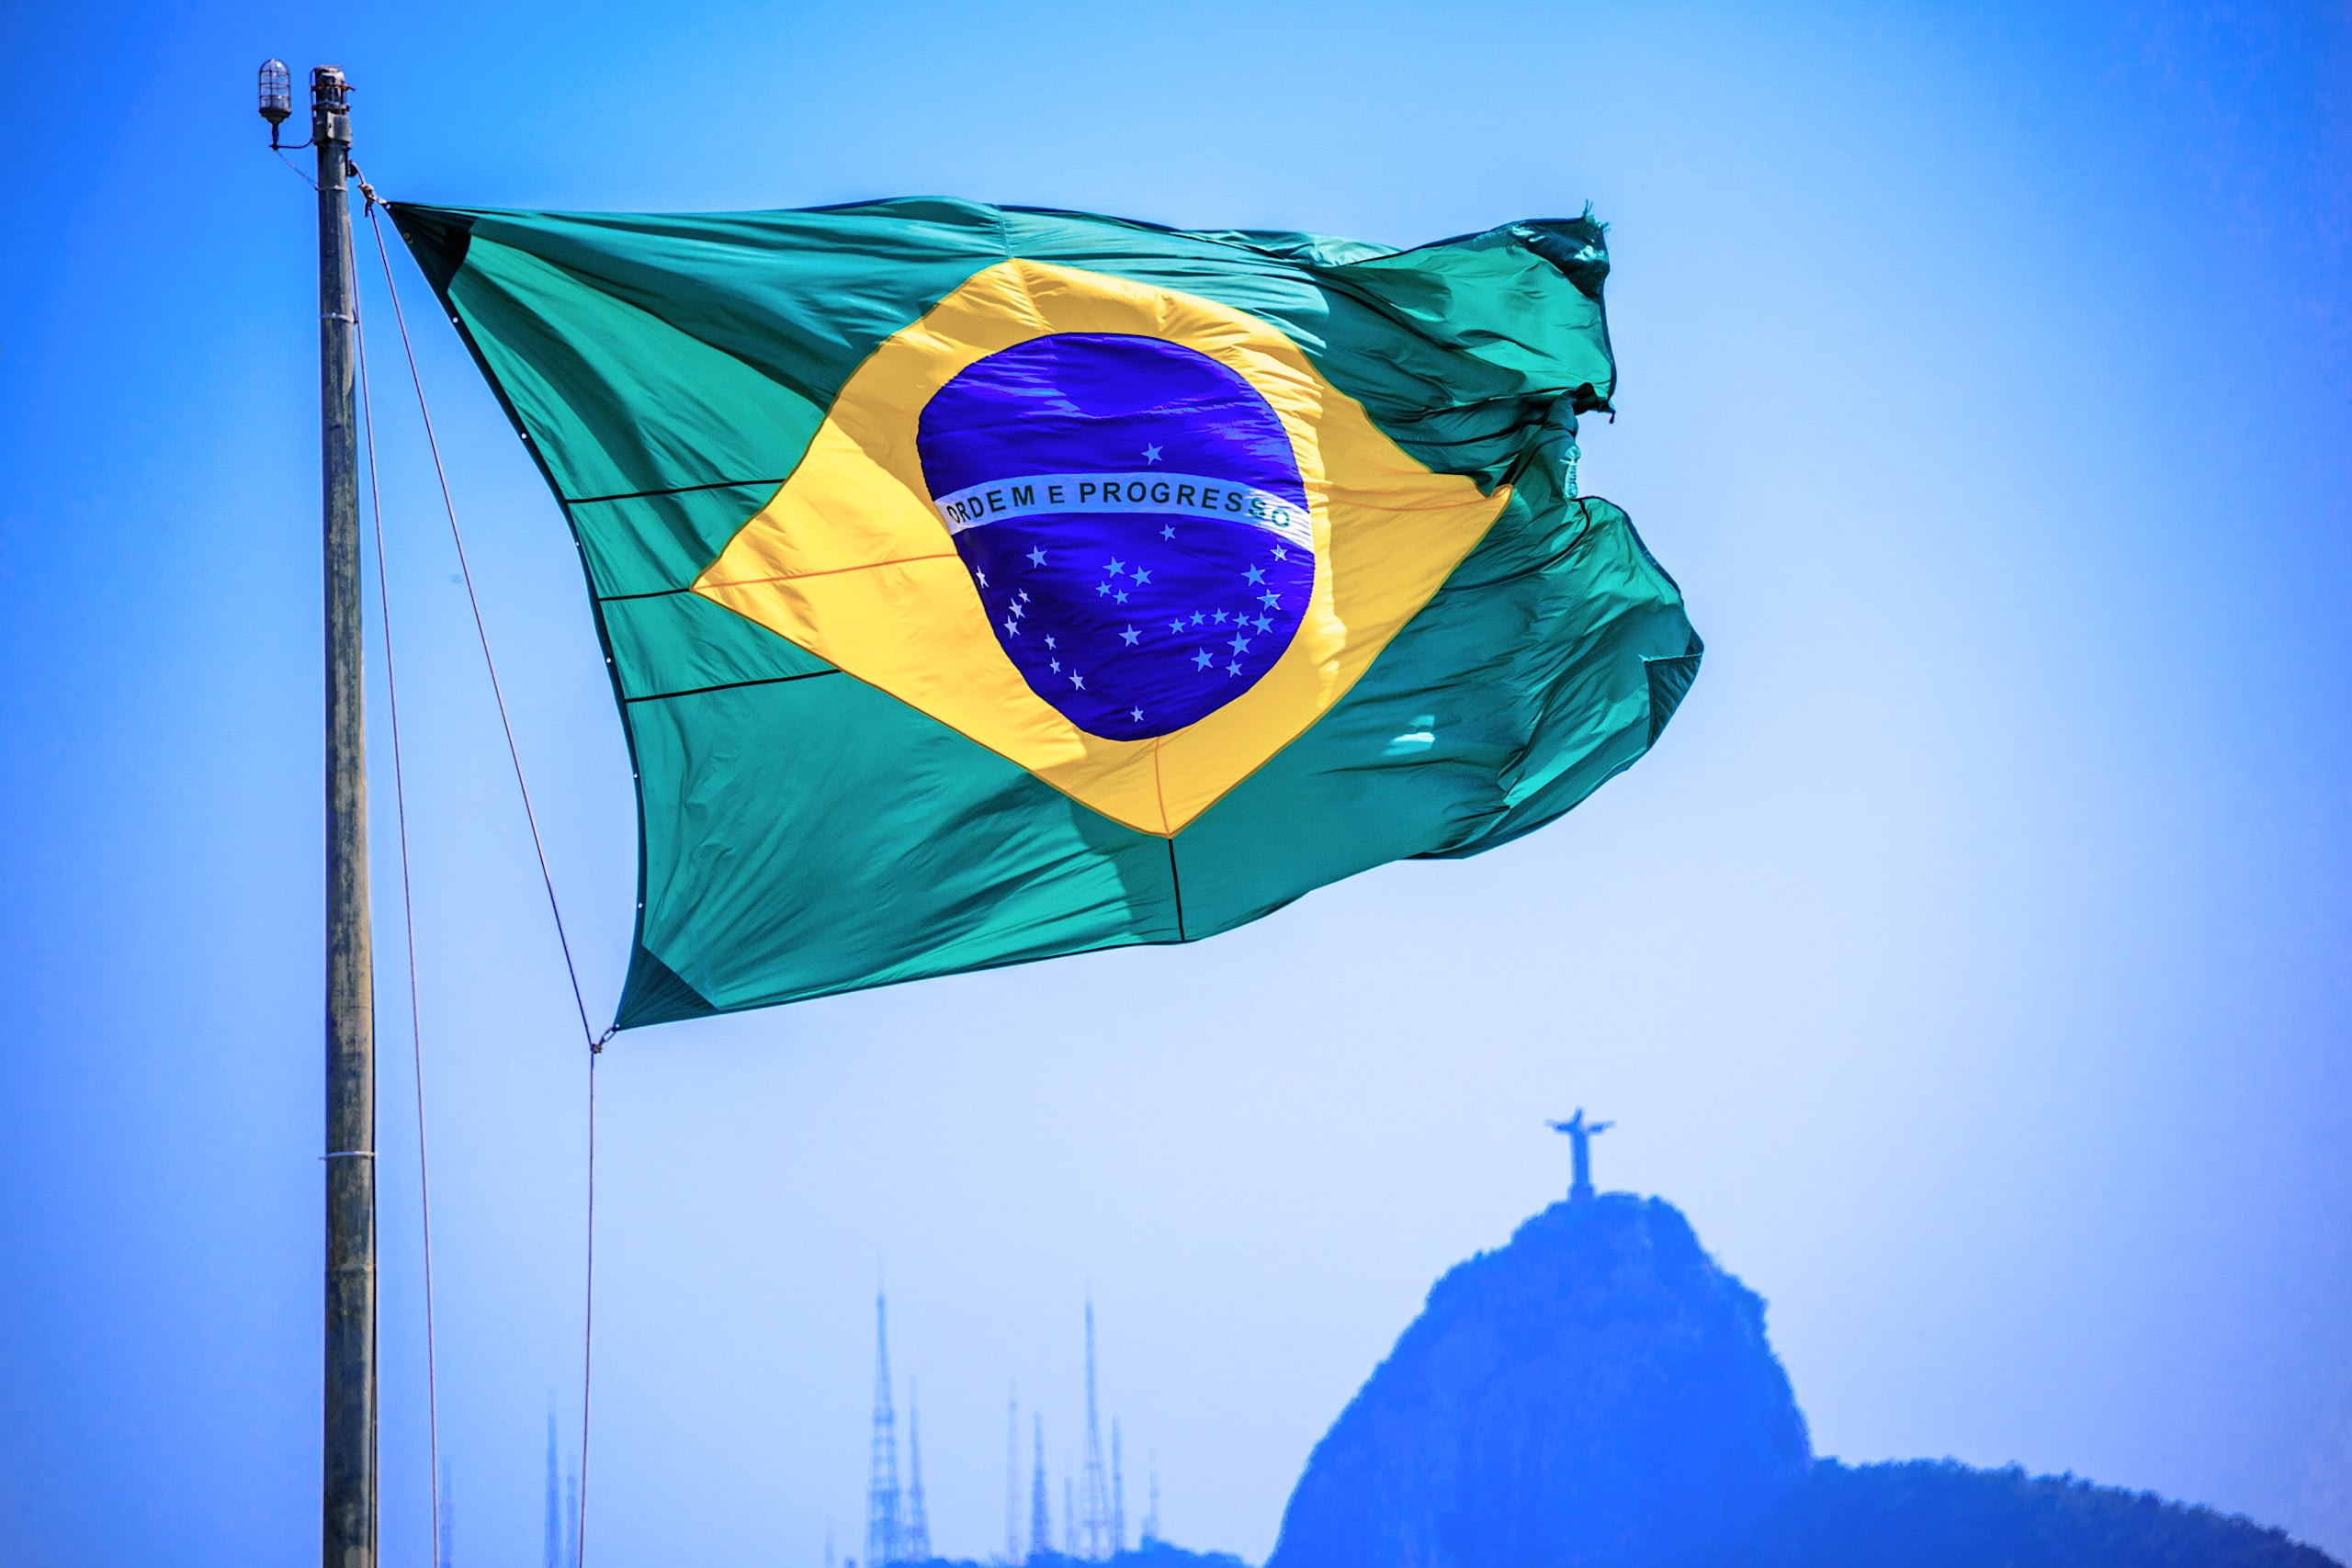 Criptointercambio brasileño Mercado Bitcoin ofrecerá soporte para el token de Chiliz, marcando la expansión de la firma por América Latina